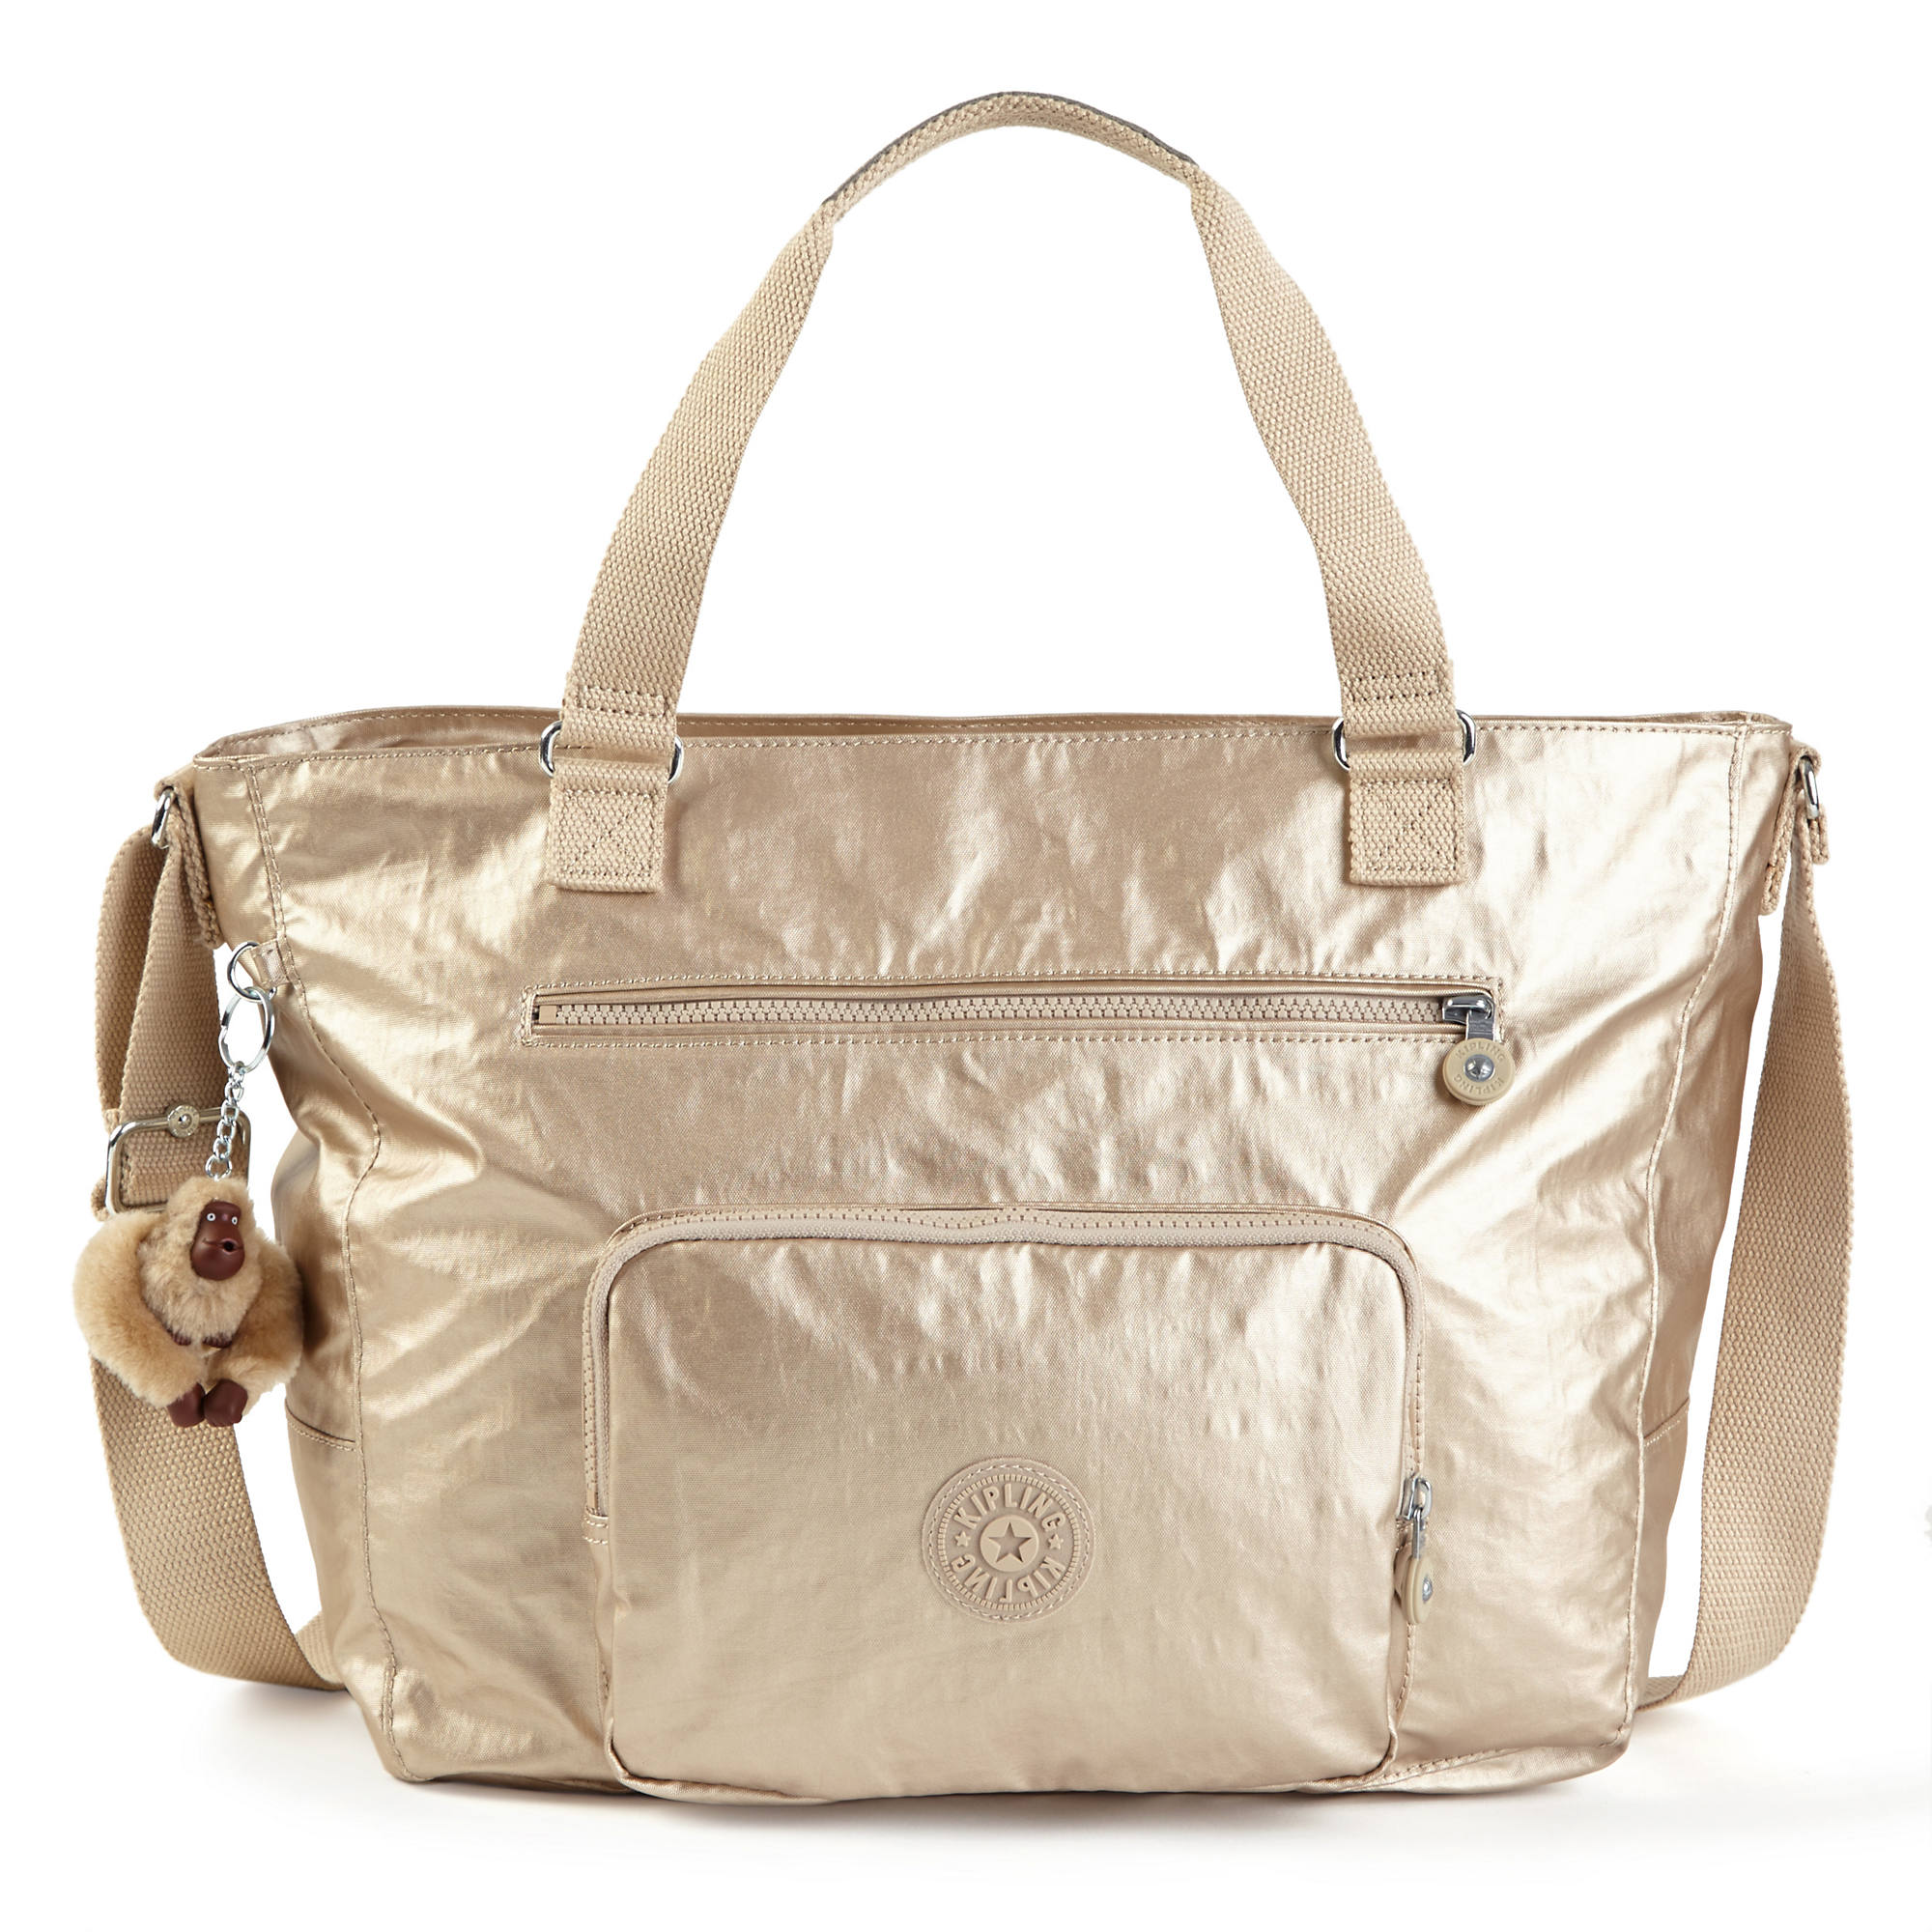 6d533b8dc Metallic Maxwell Tote Bag,Toasty Gold,large